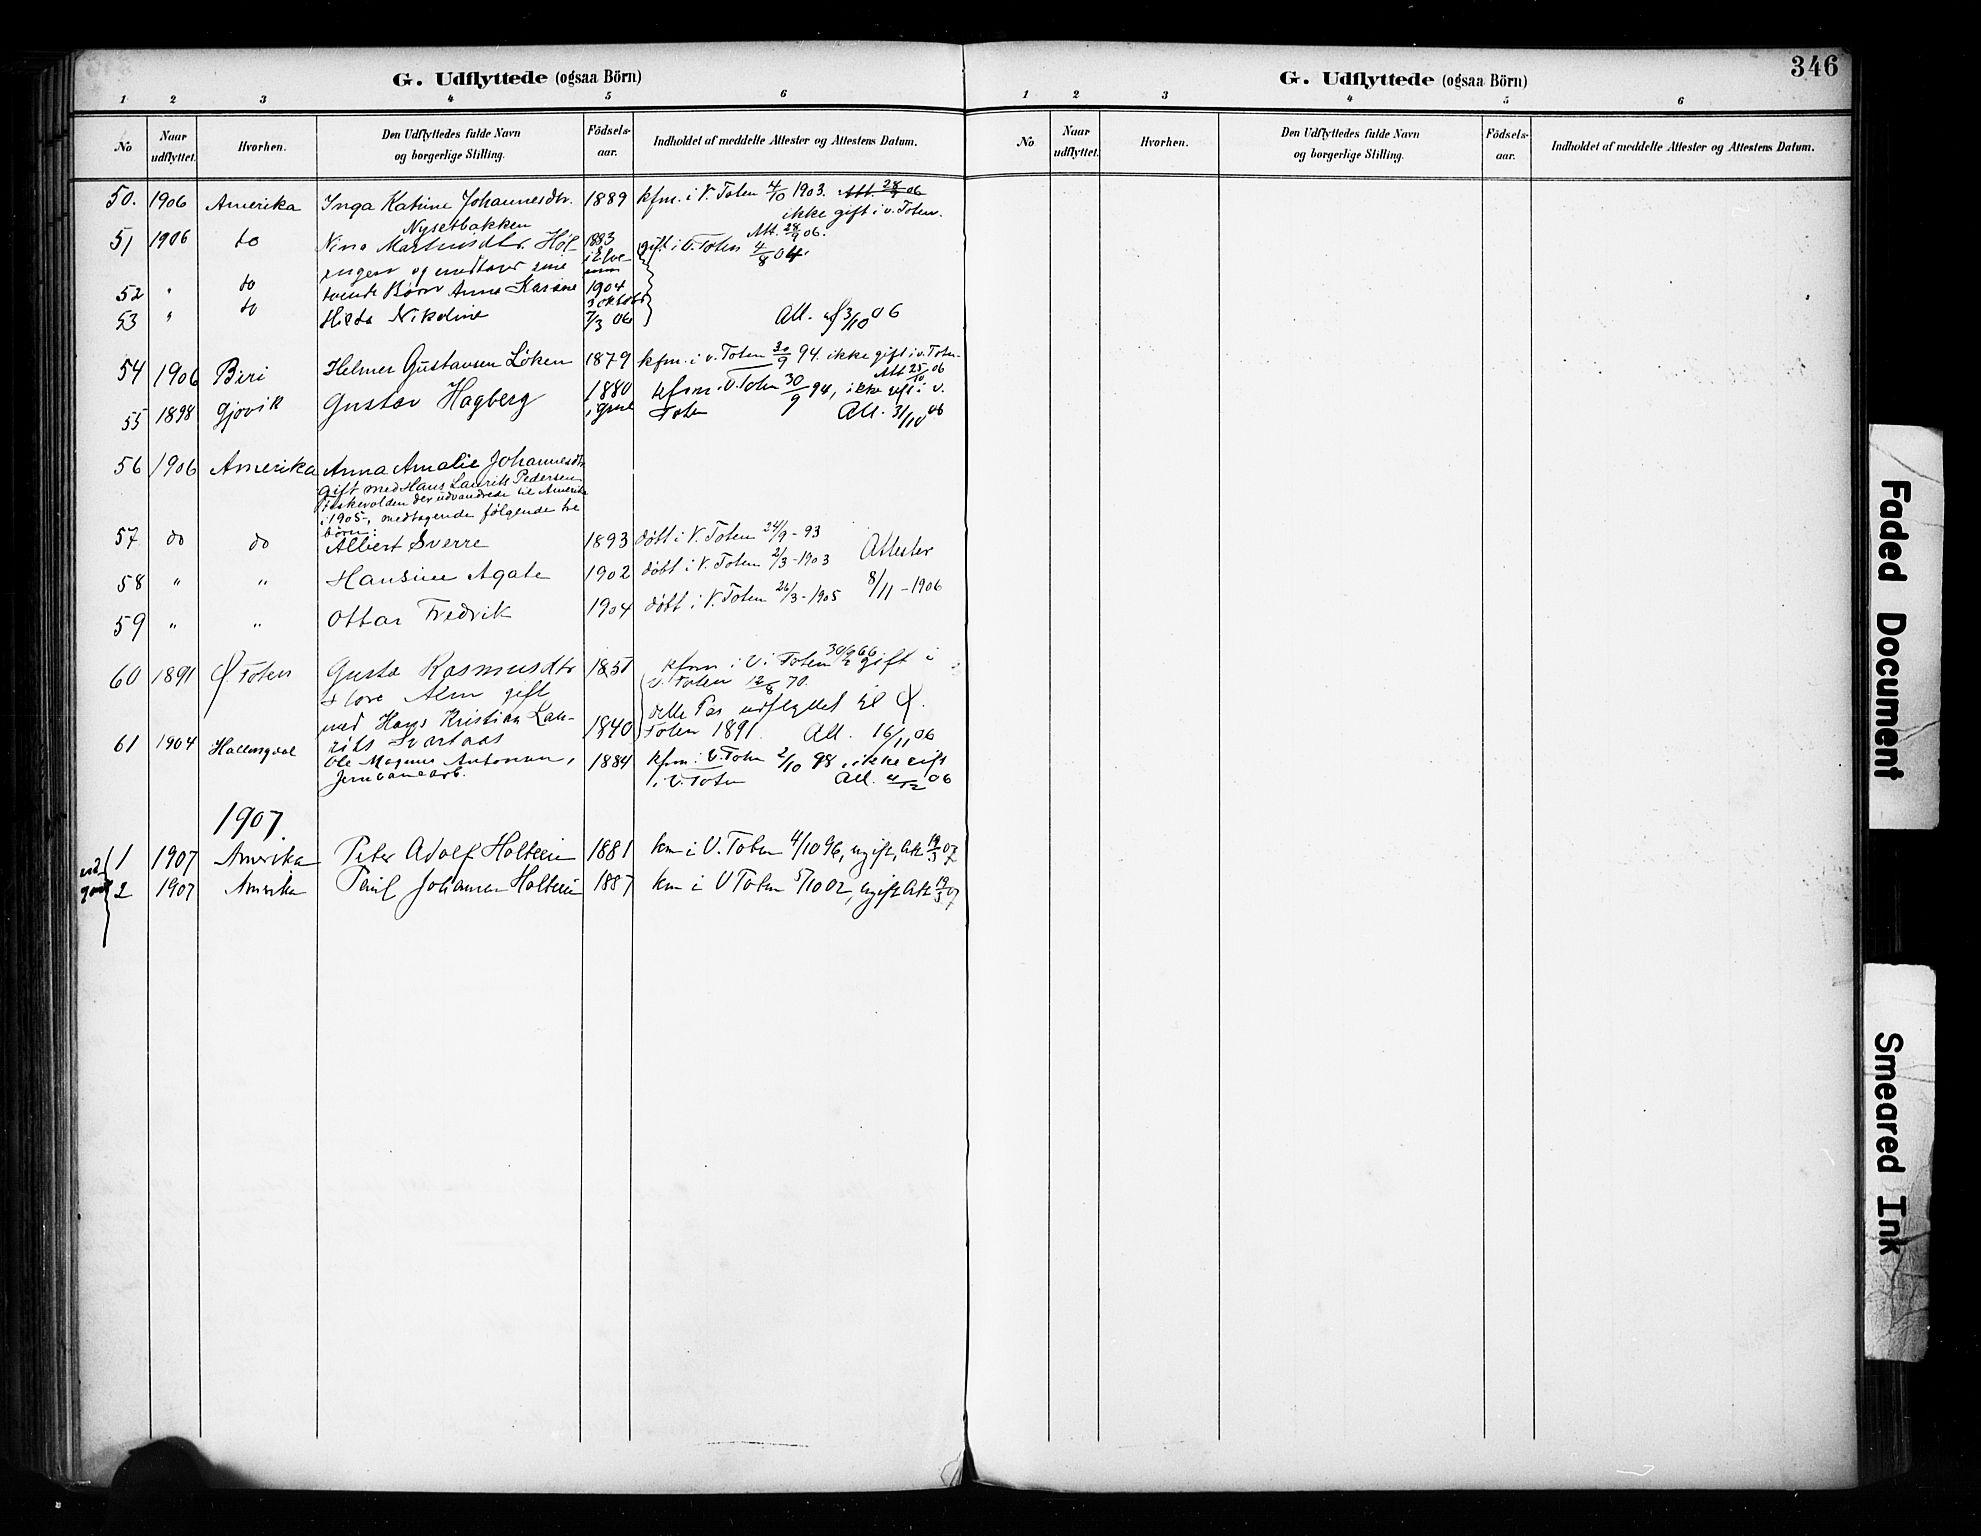 SAH, Vestre Toten prestekontor, H/Ha/Haa/L0011: Ministerialbok nr. 11, 1895-1906, s. 346